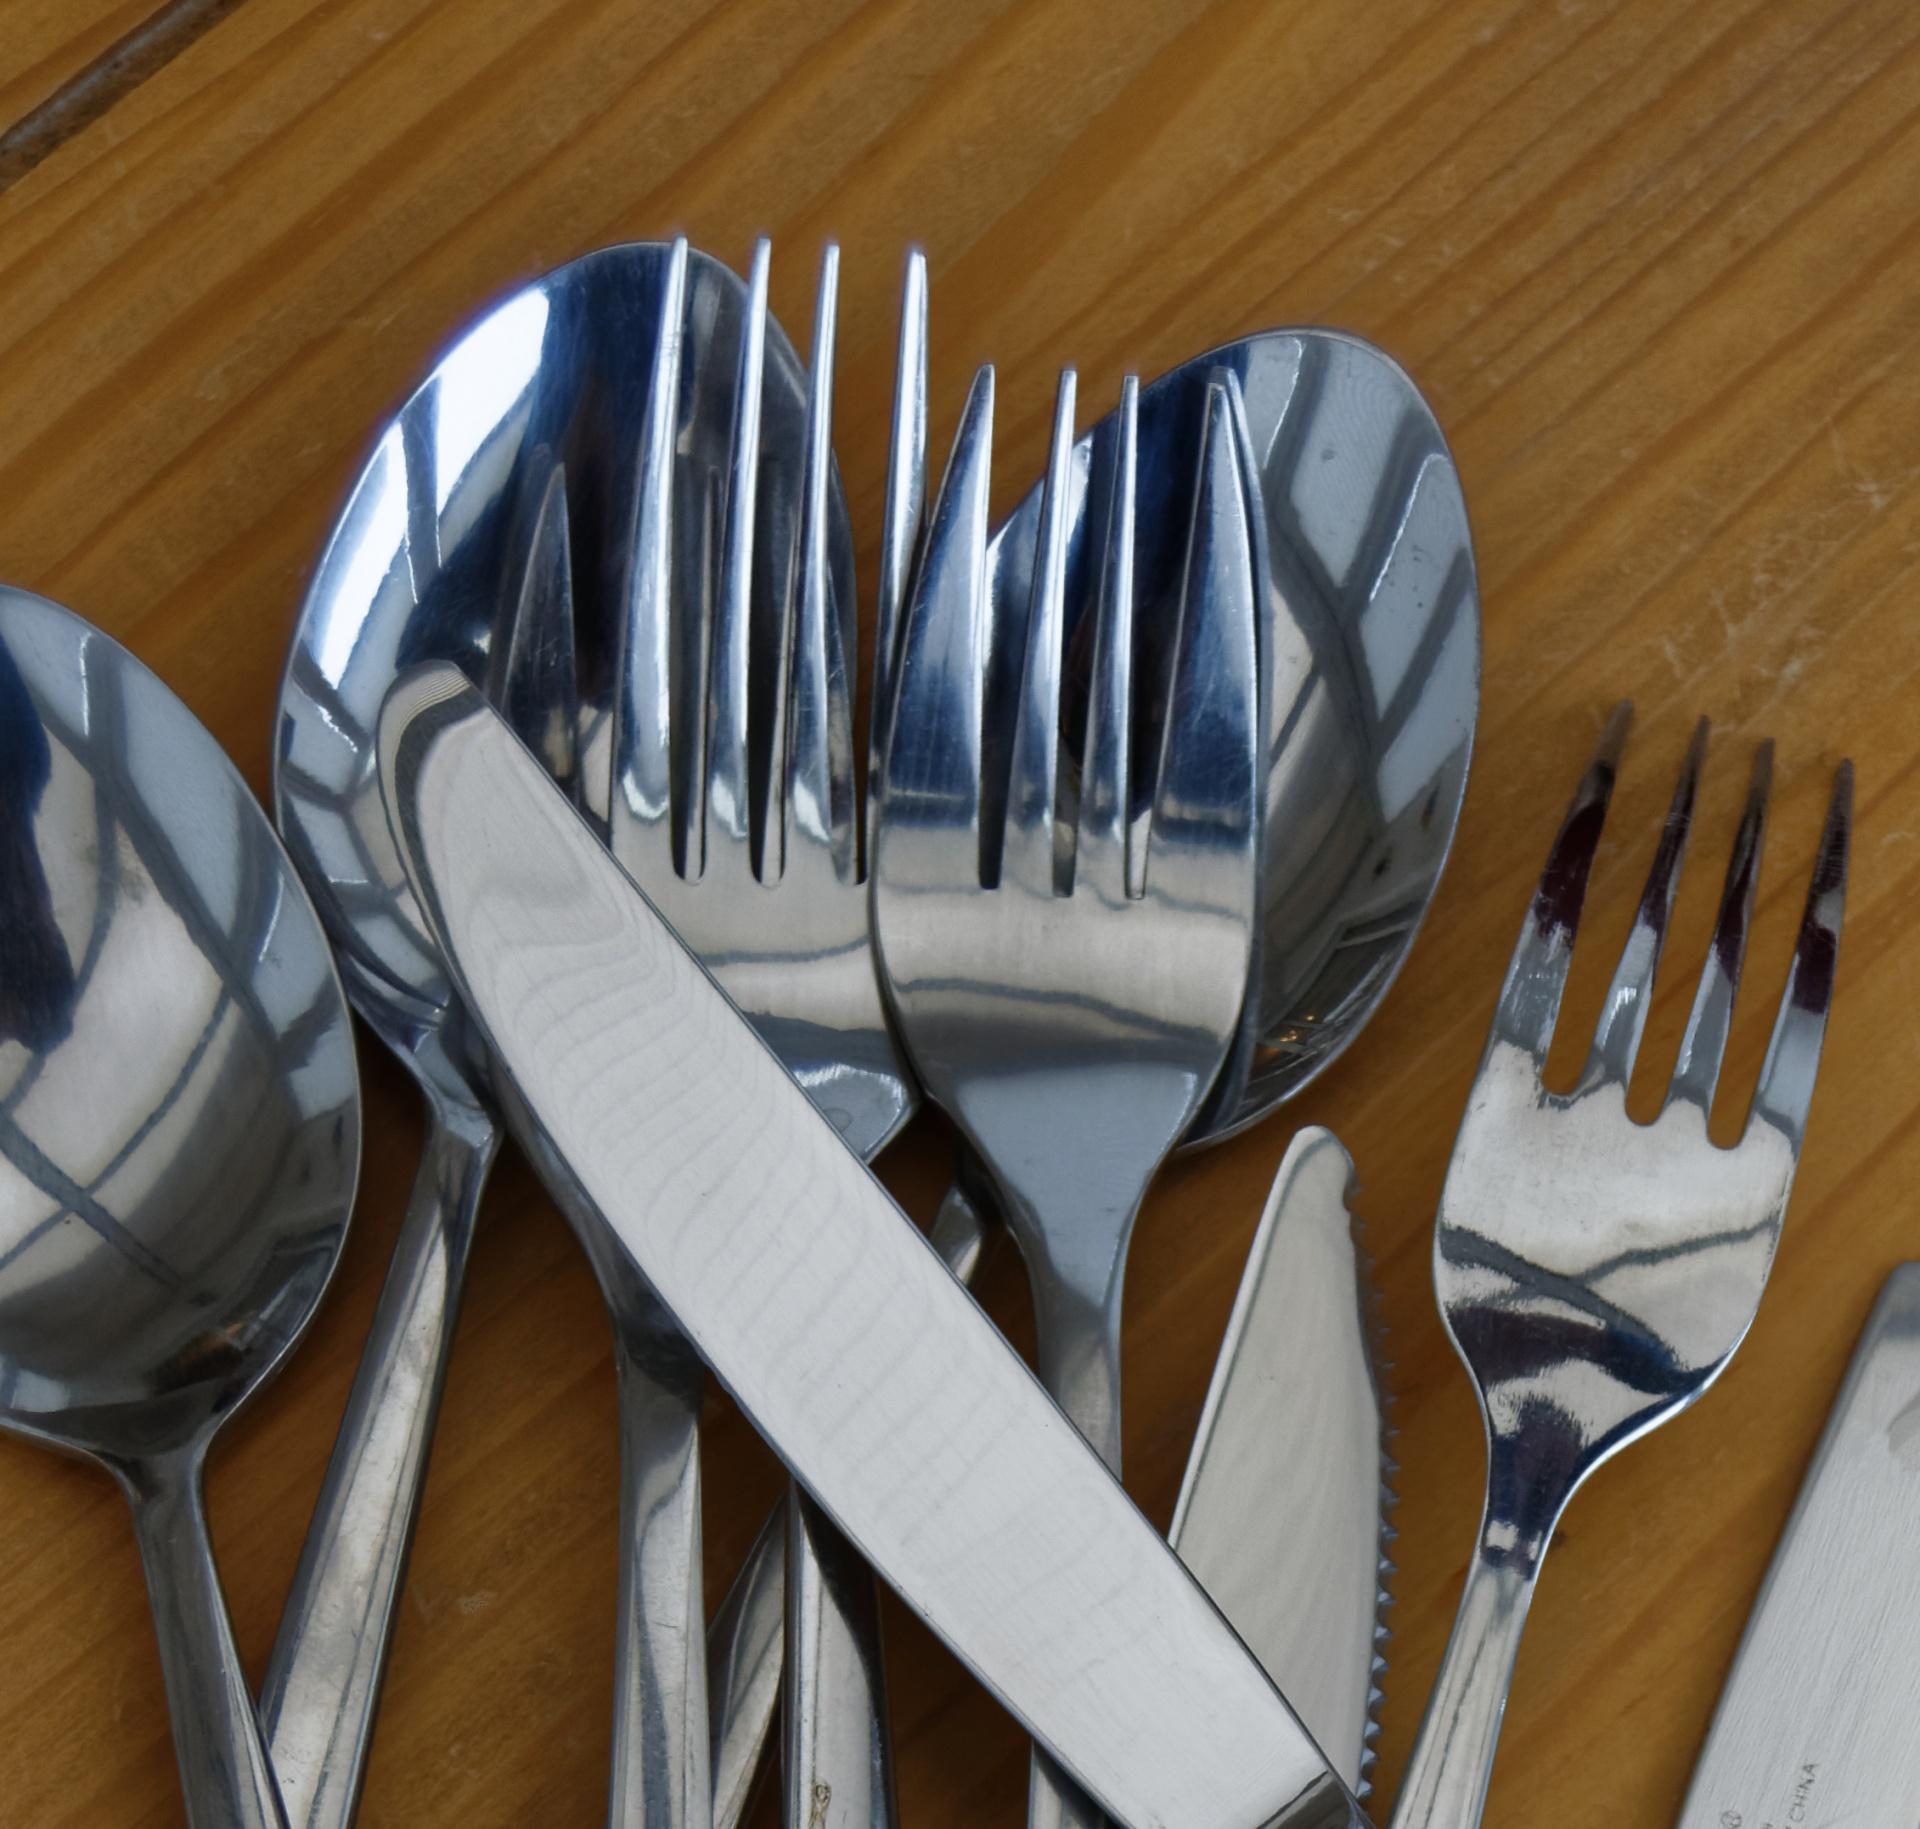 Poetry, Eating Utensils, Forks, Flatware